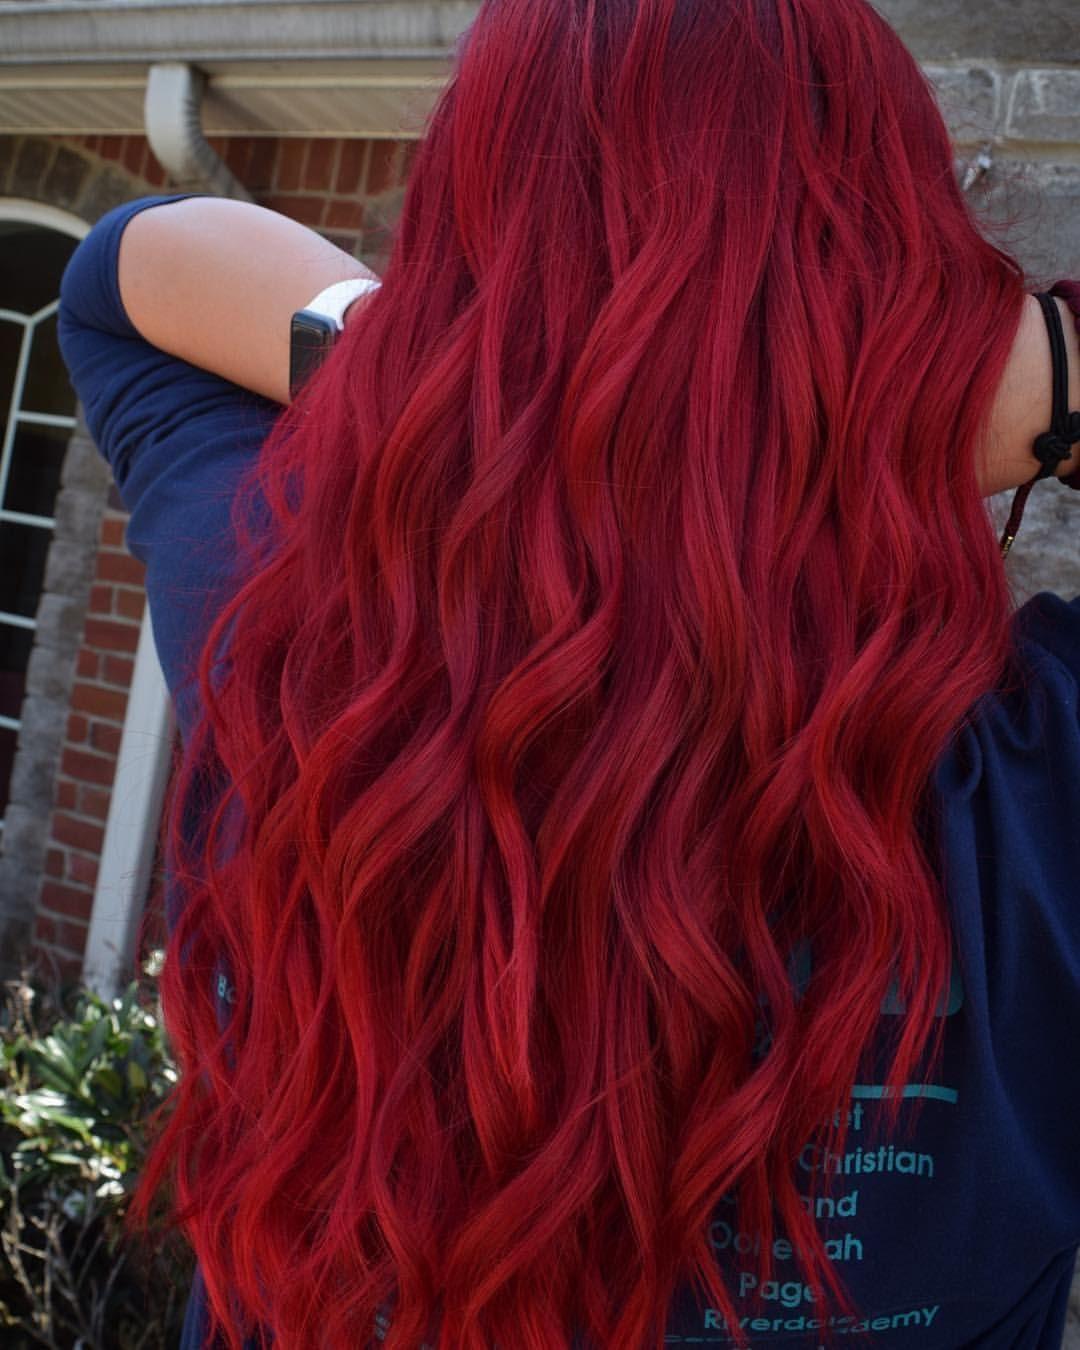 10 Cute Fun Red Hair Color Ideas red hair crimson red vibrant bright fun hair color guy tang 2020